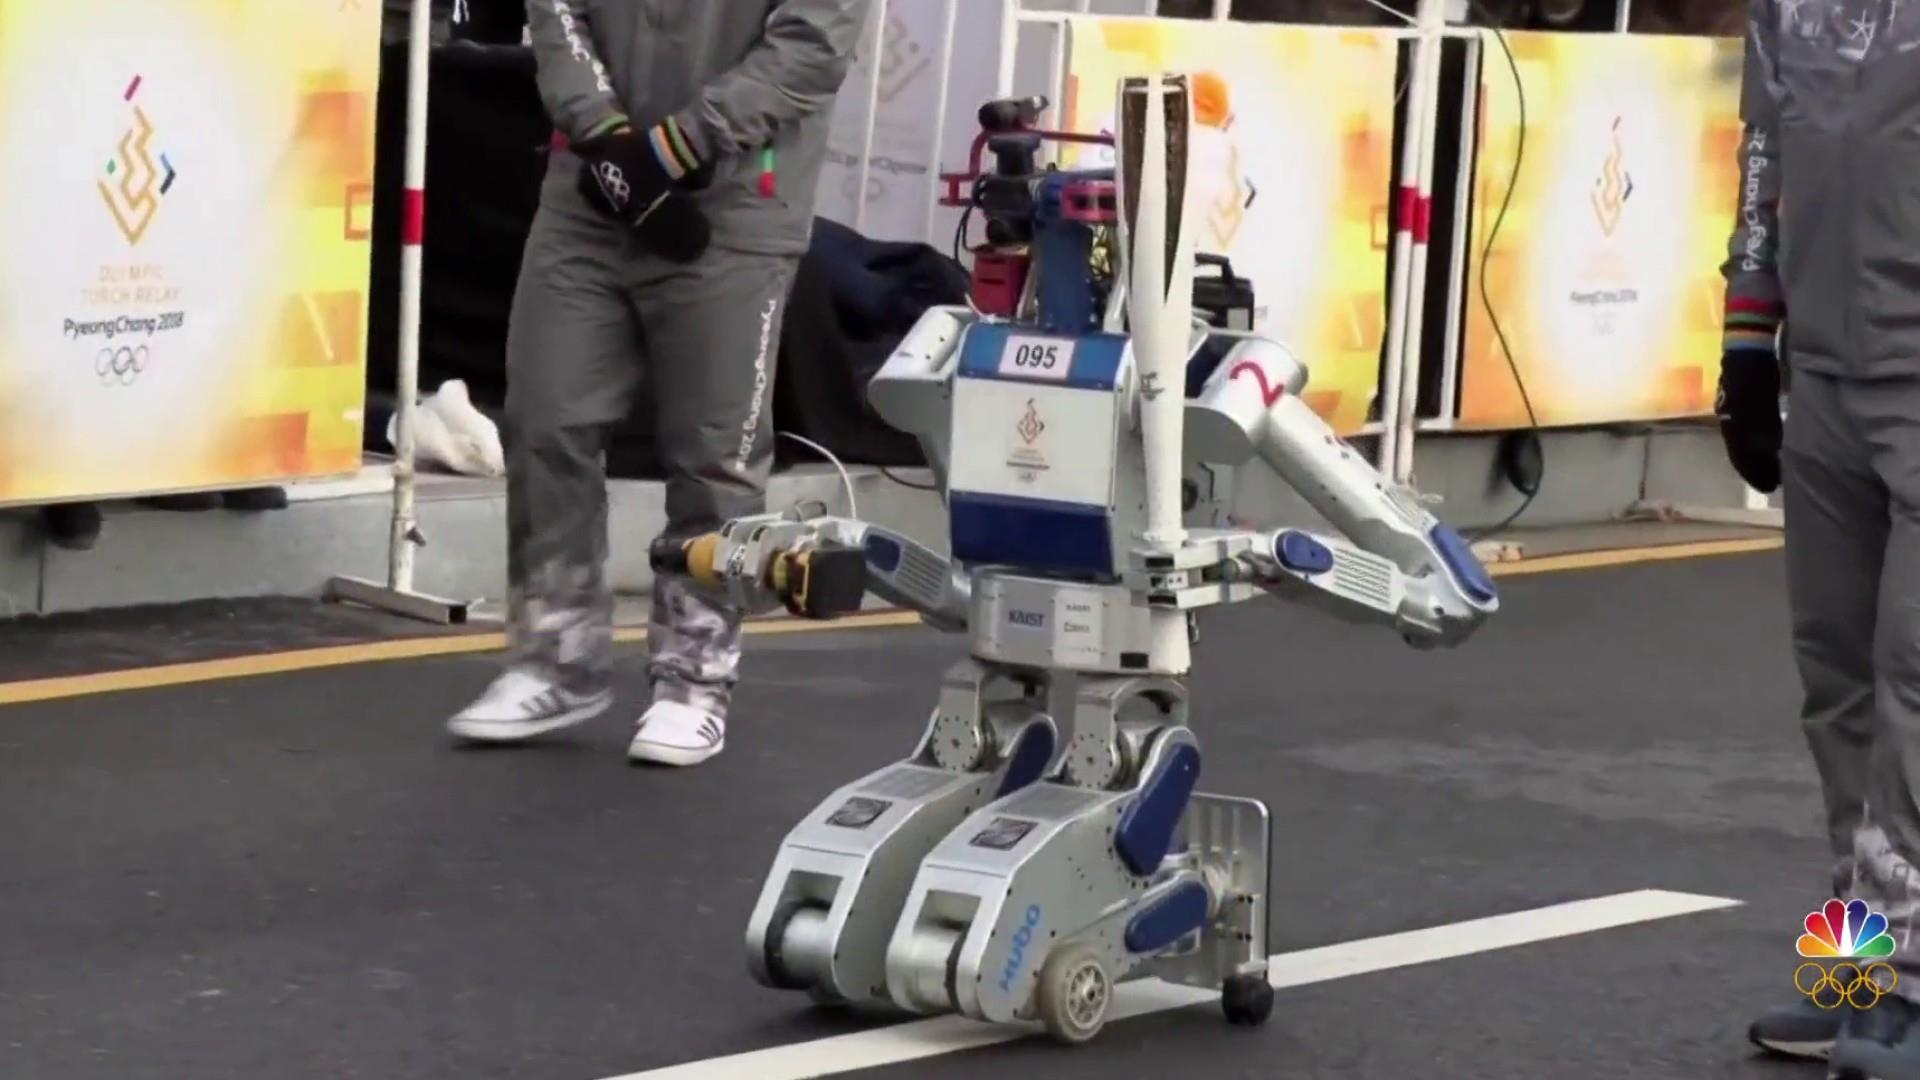 Tv Plasma Kast.South Korea Showcases Innovative Technology During Olympic Games